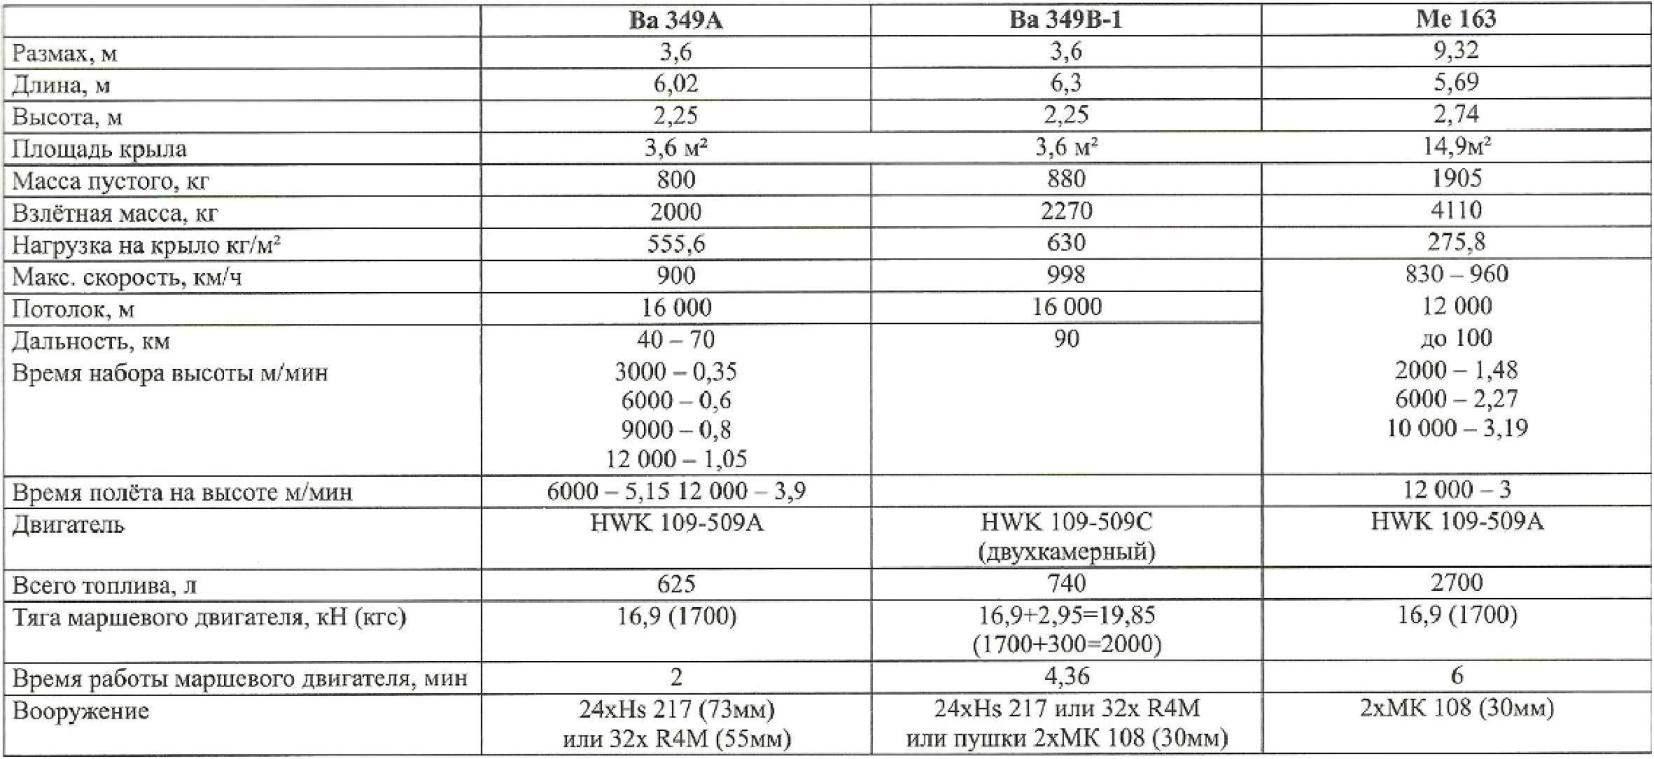 Технические данные самолётов Ва 349 «Наттер» и Me 163